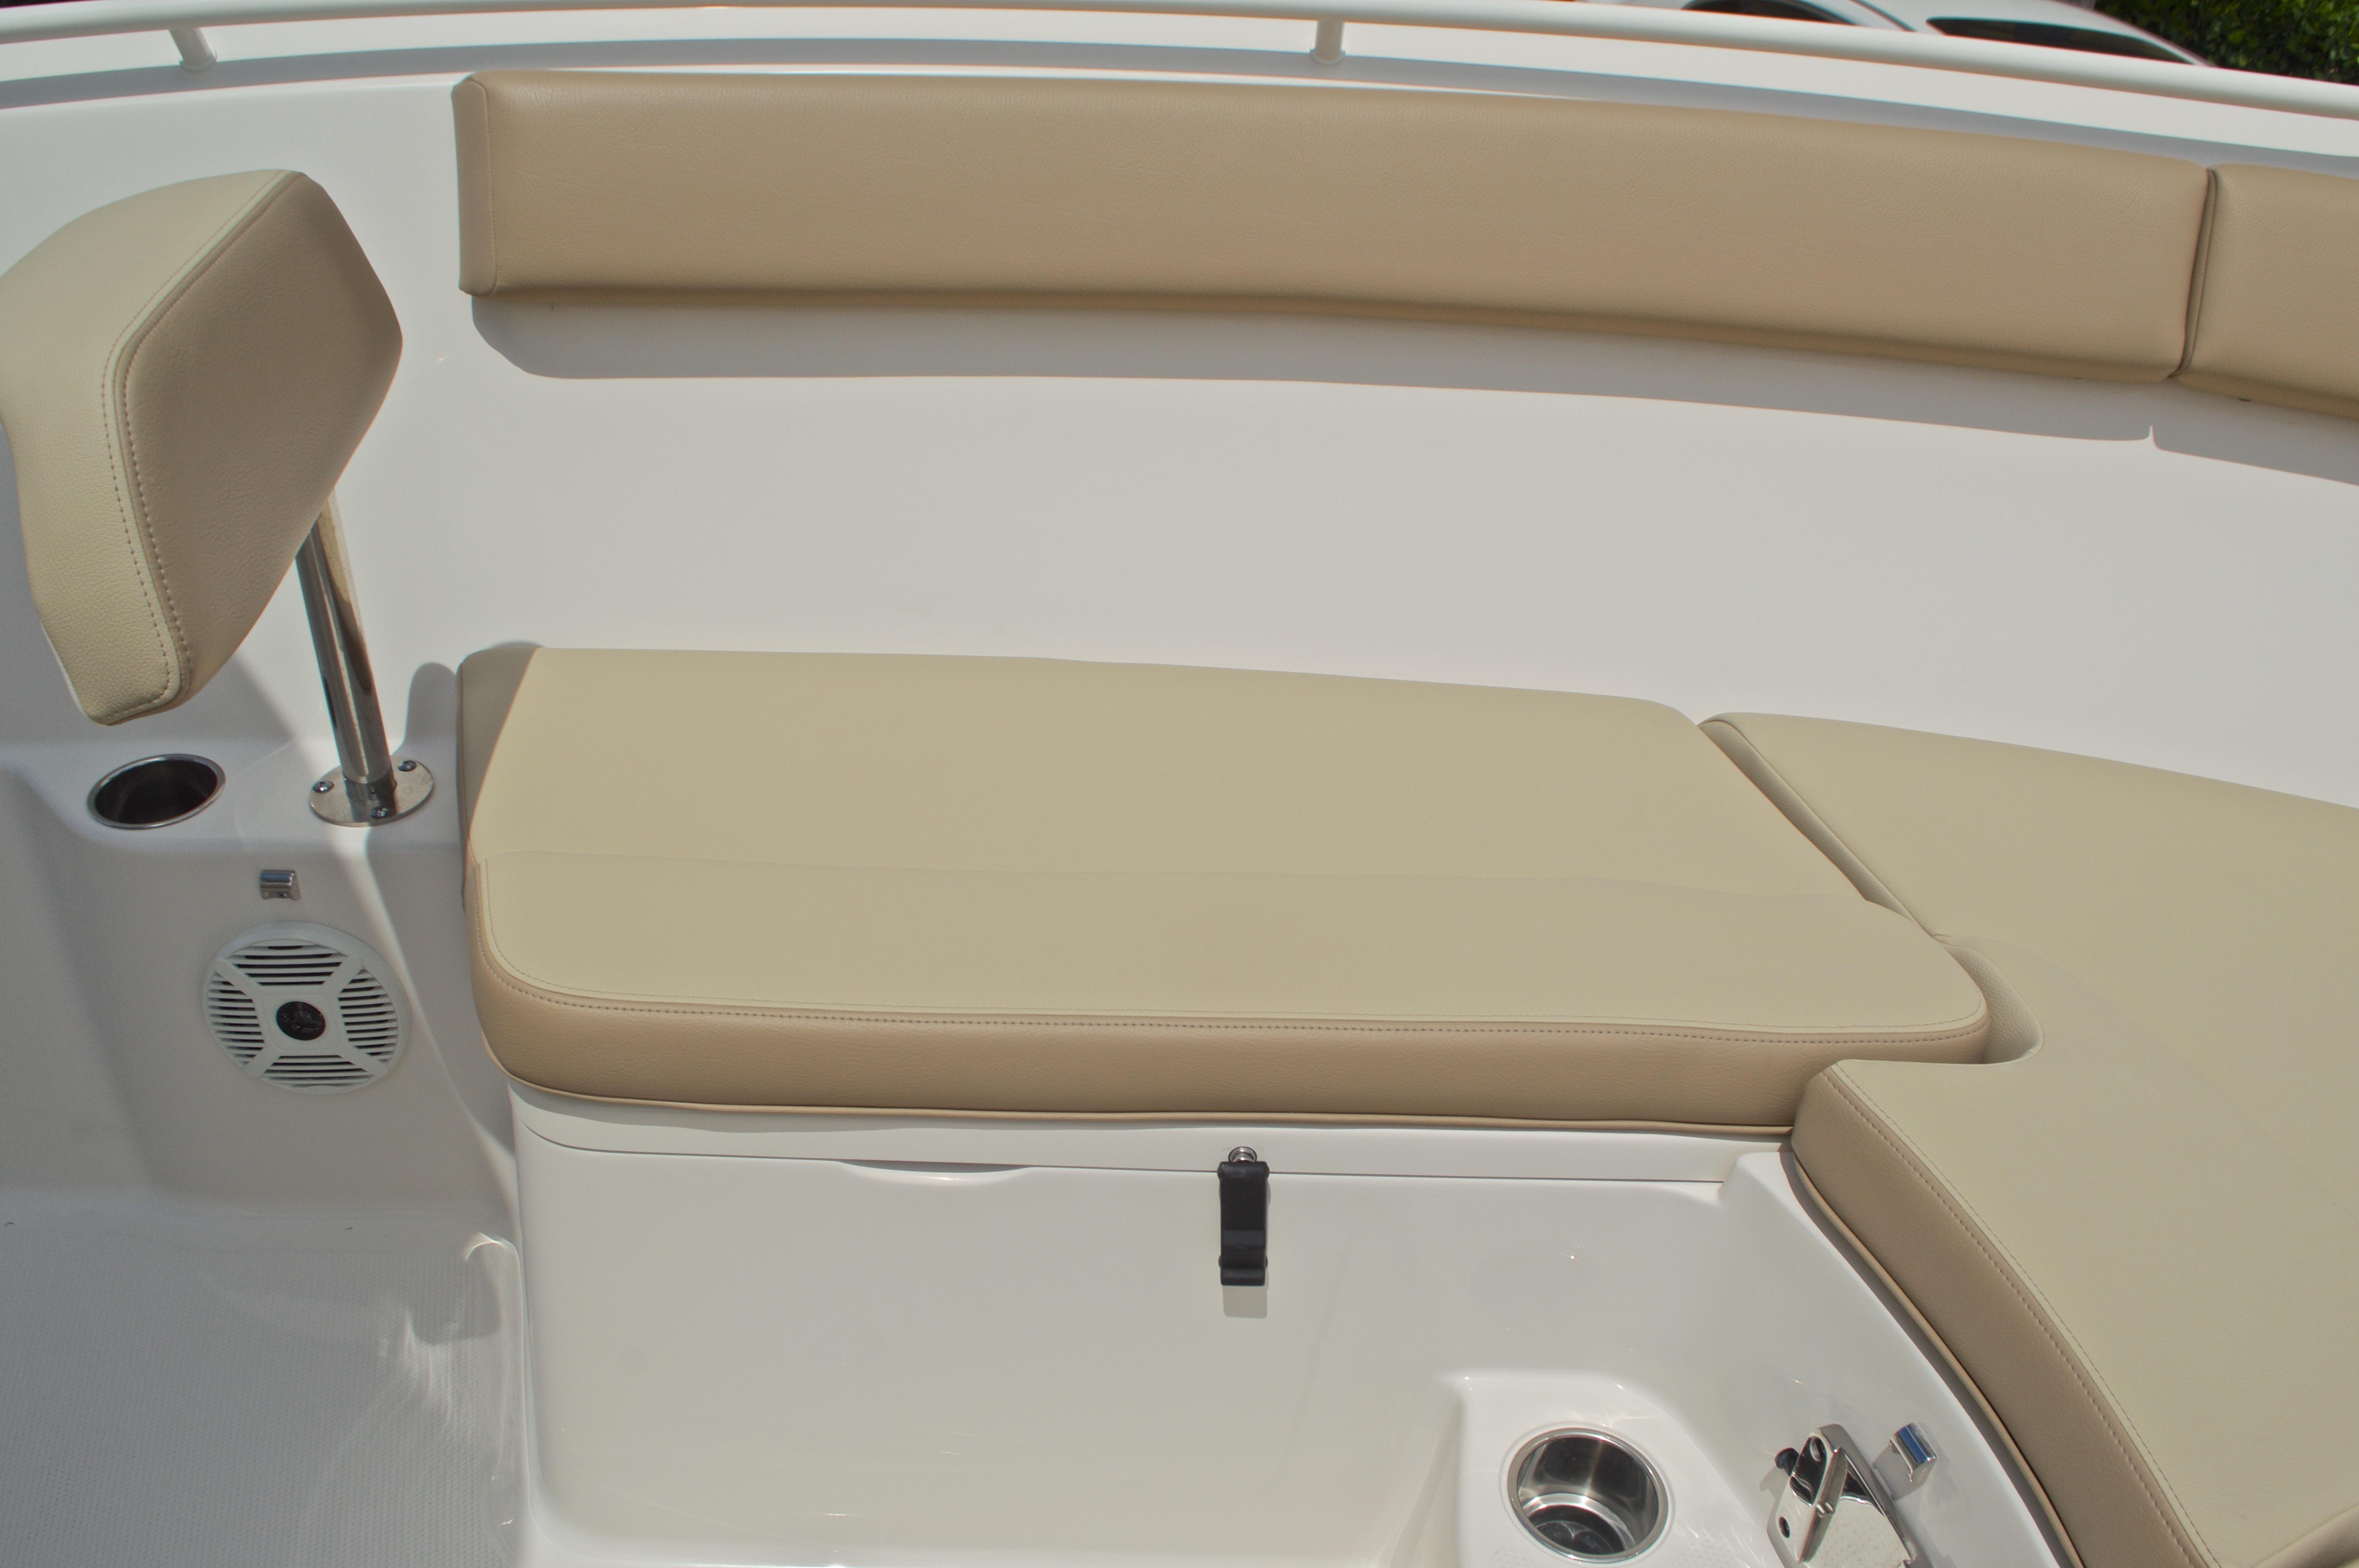 Thumbnail 48 for New 2017 Sailfish 240 CC Center Console boat for sale in Miami, FL